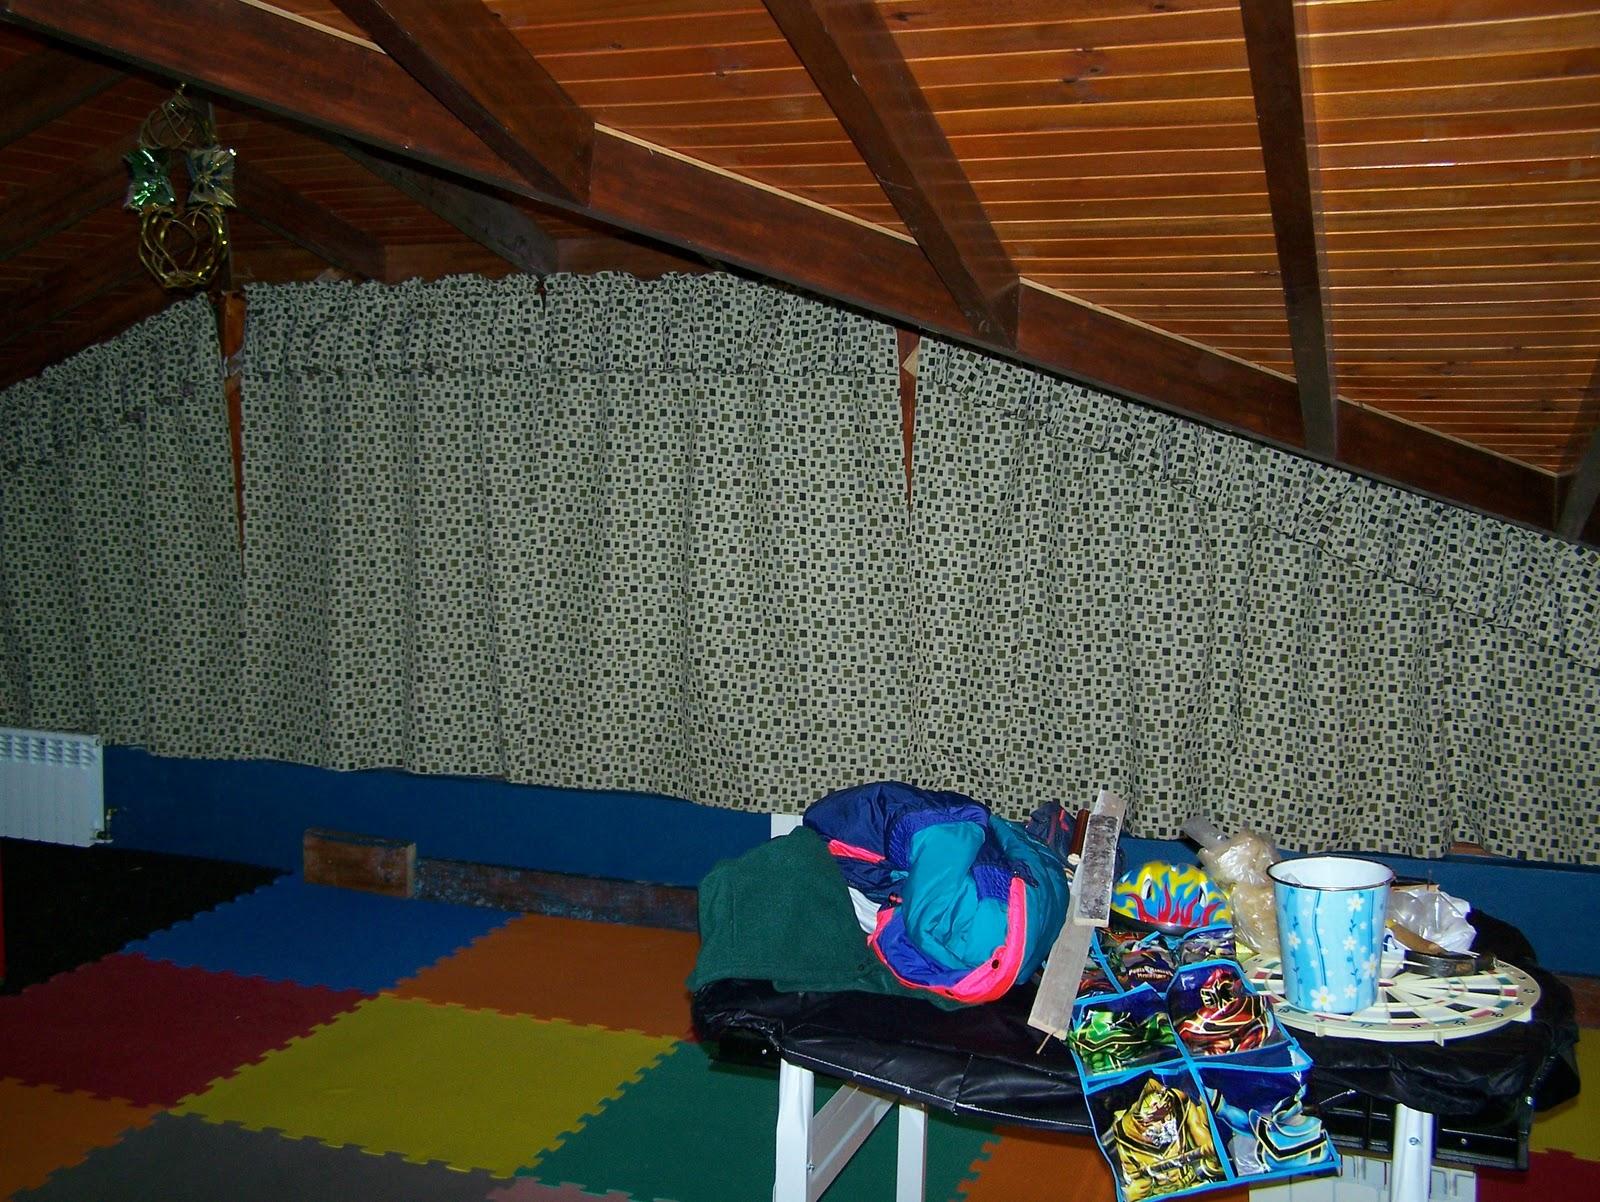 Cortinas mas tapiceria cortinas presillas dormitorio - Cortinas dormitorio infantil ...